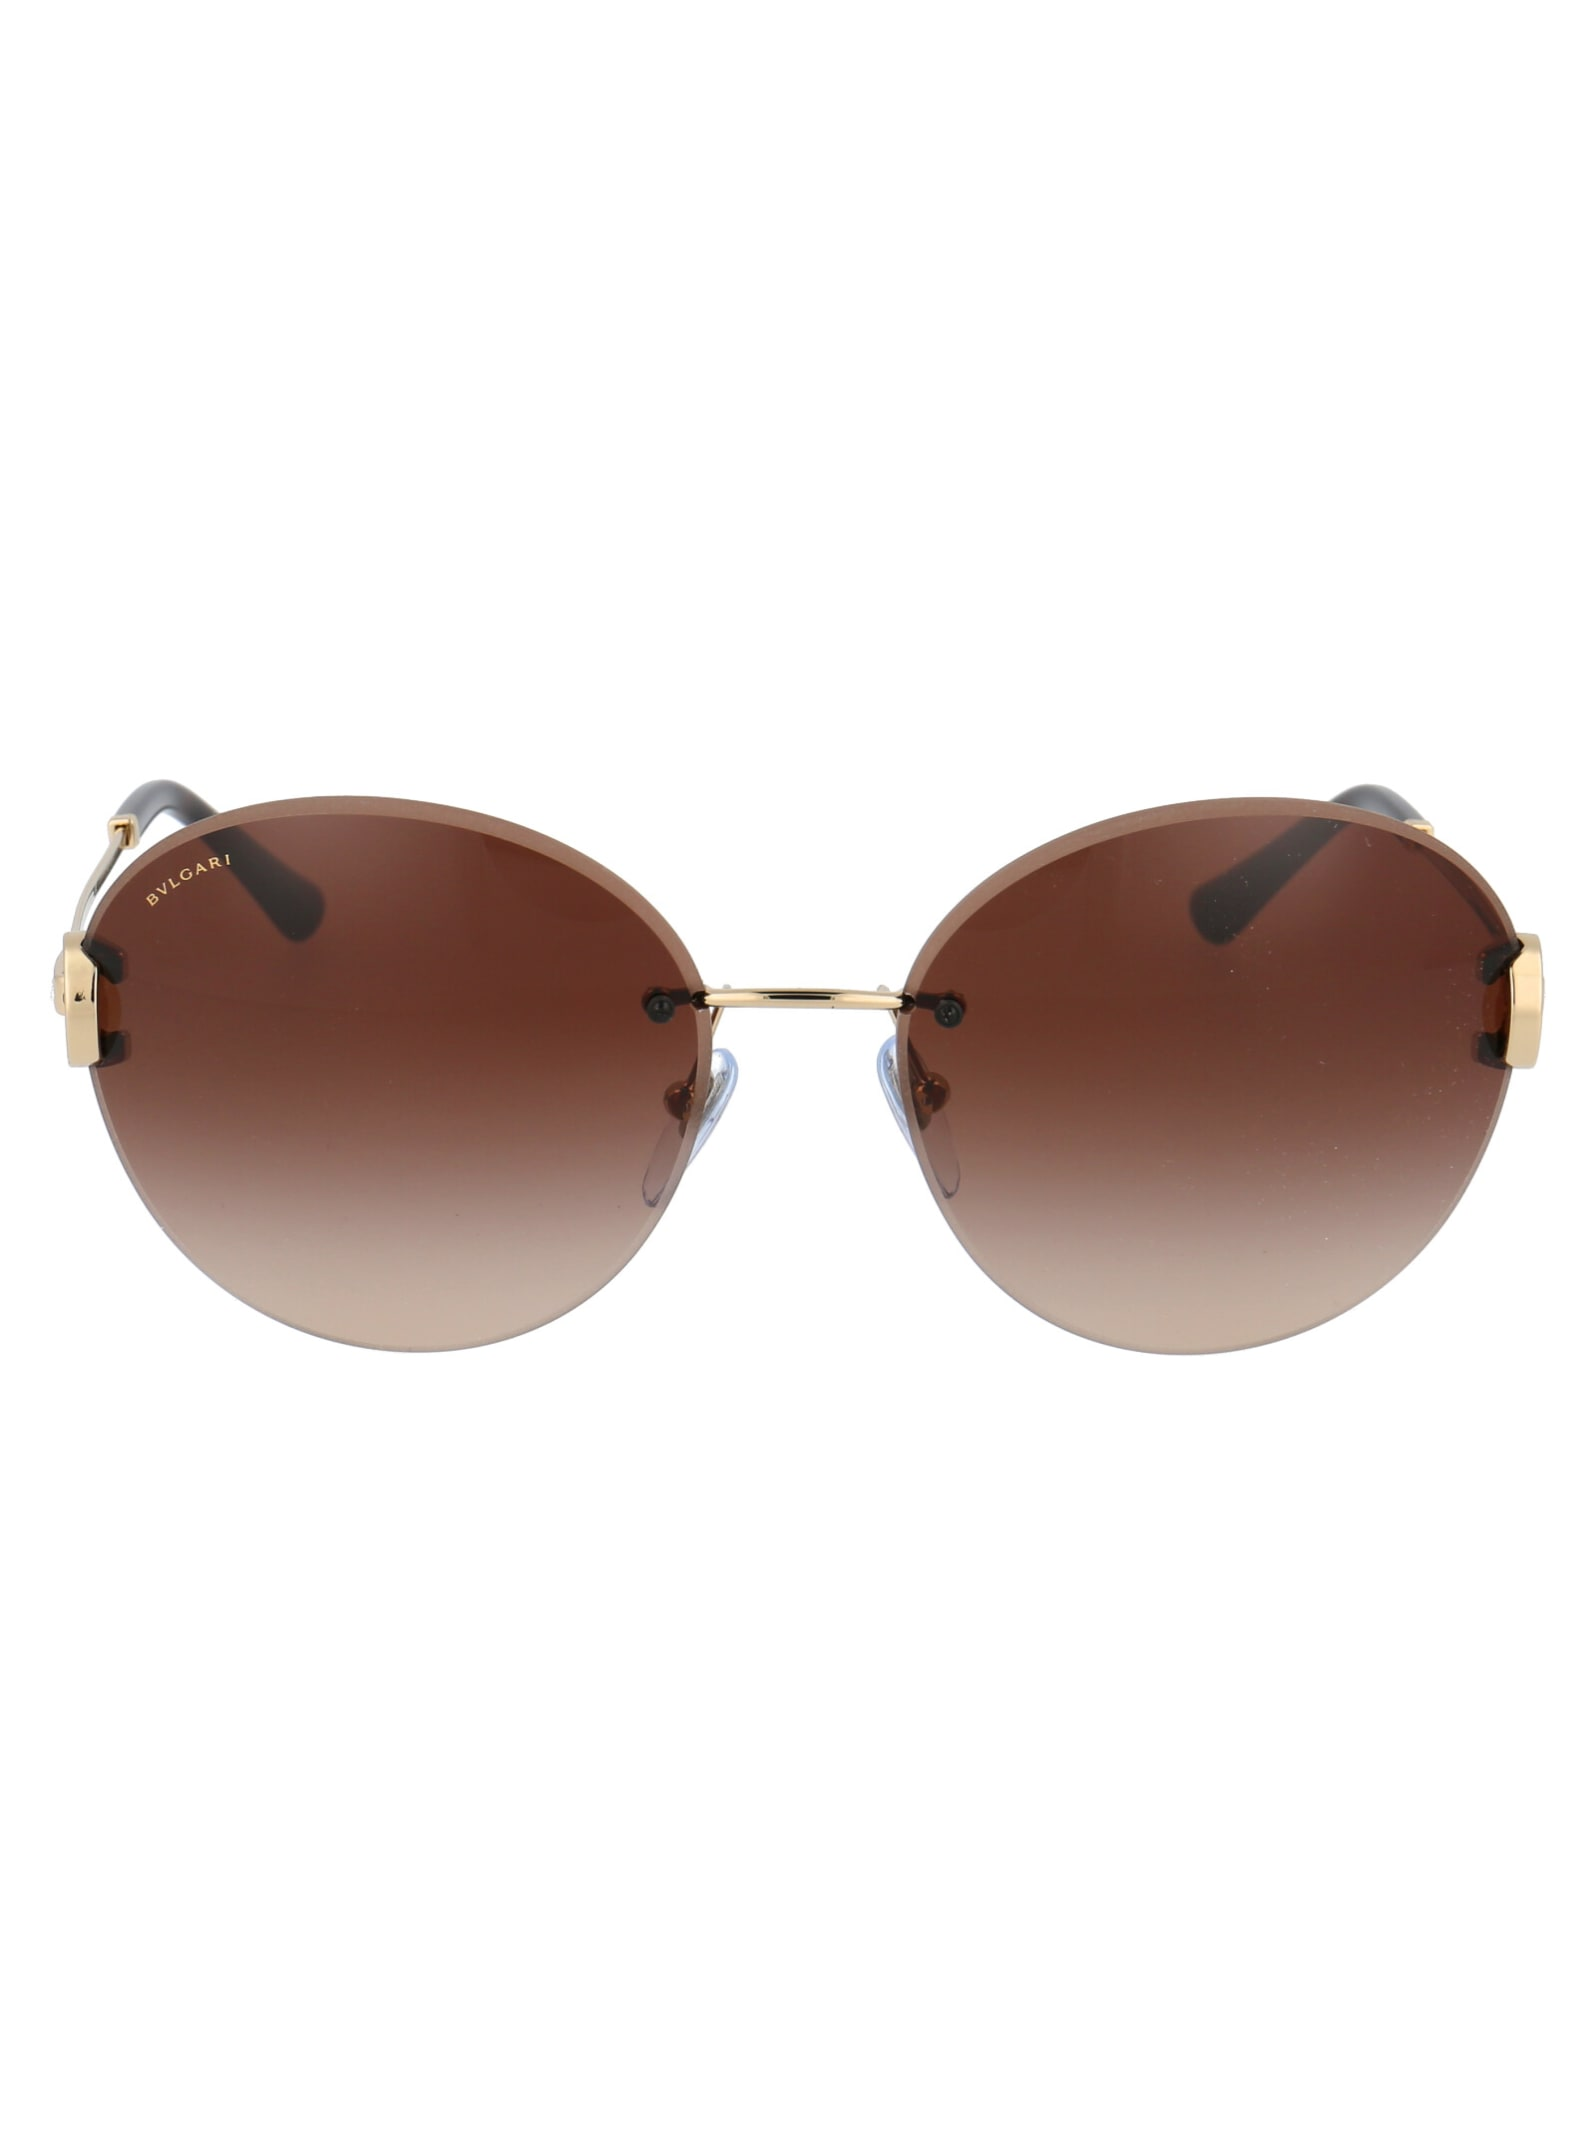 0bv6091b Sunglasses